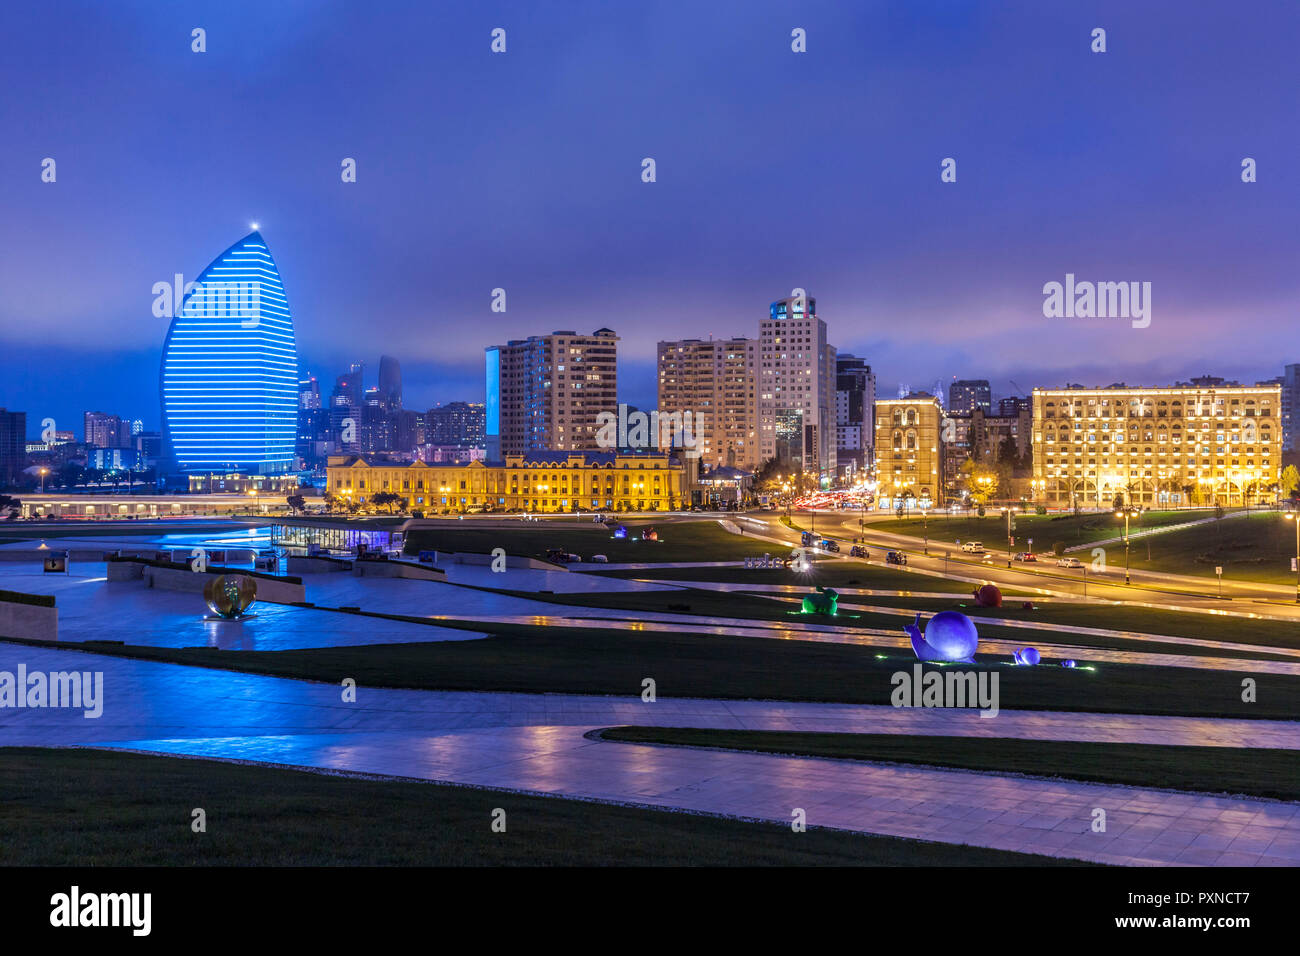 Azerbaijan, Baku, Trump Hotel and Tower - Stock Image